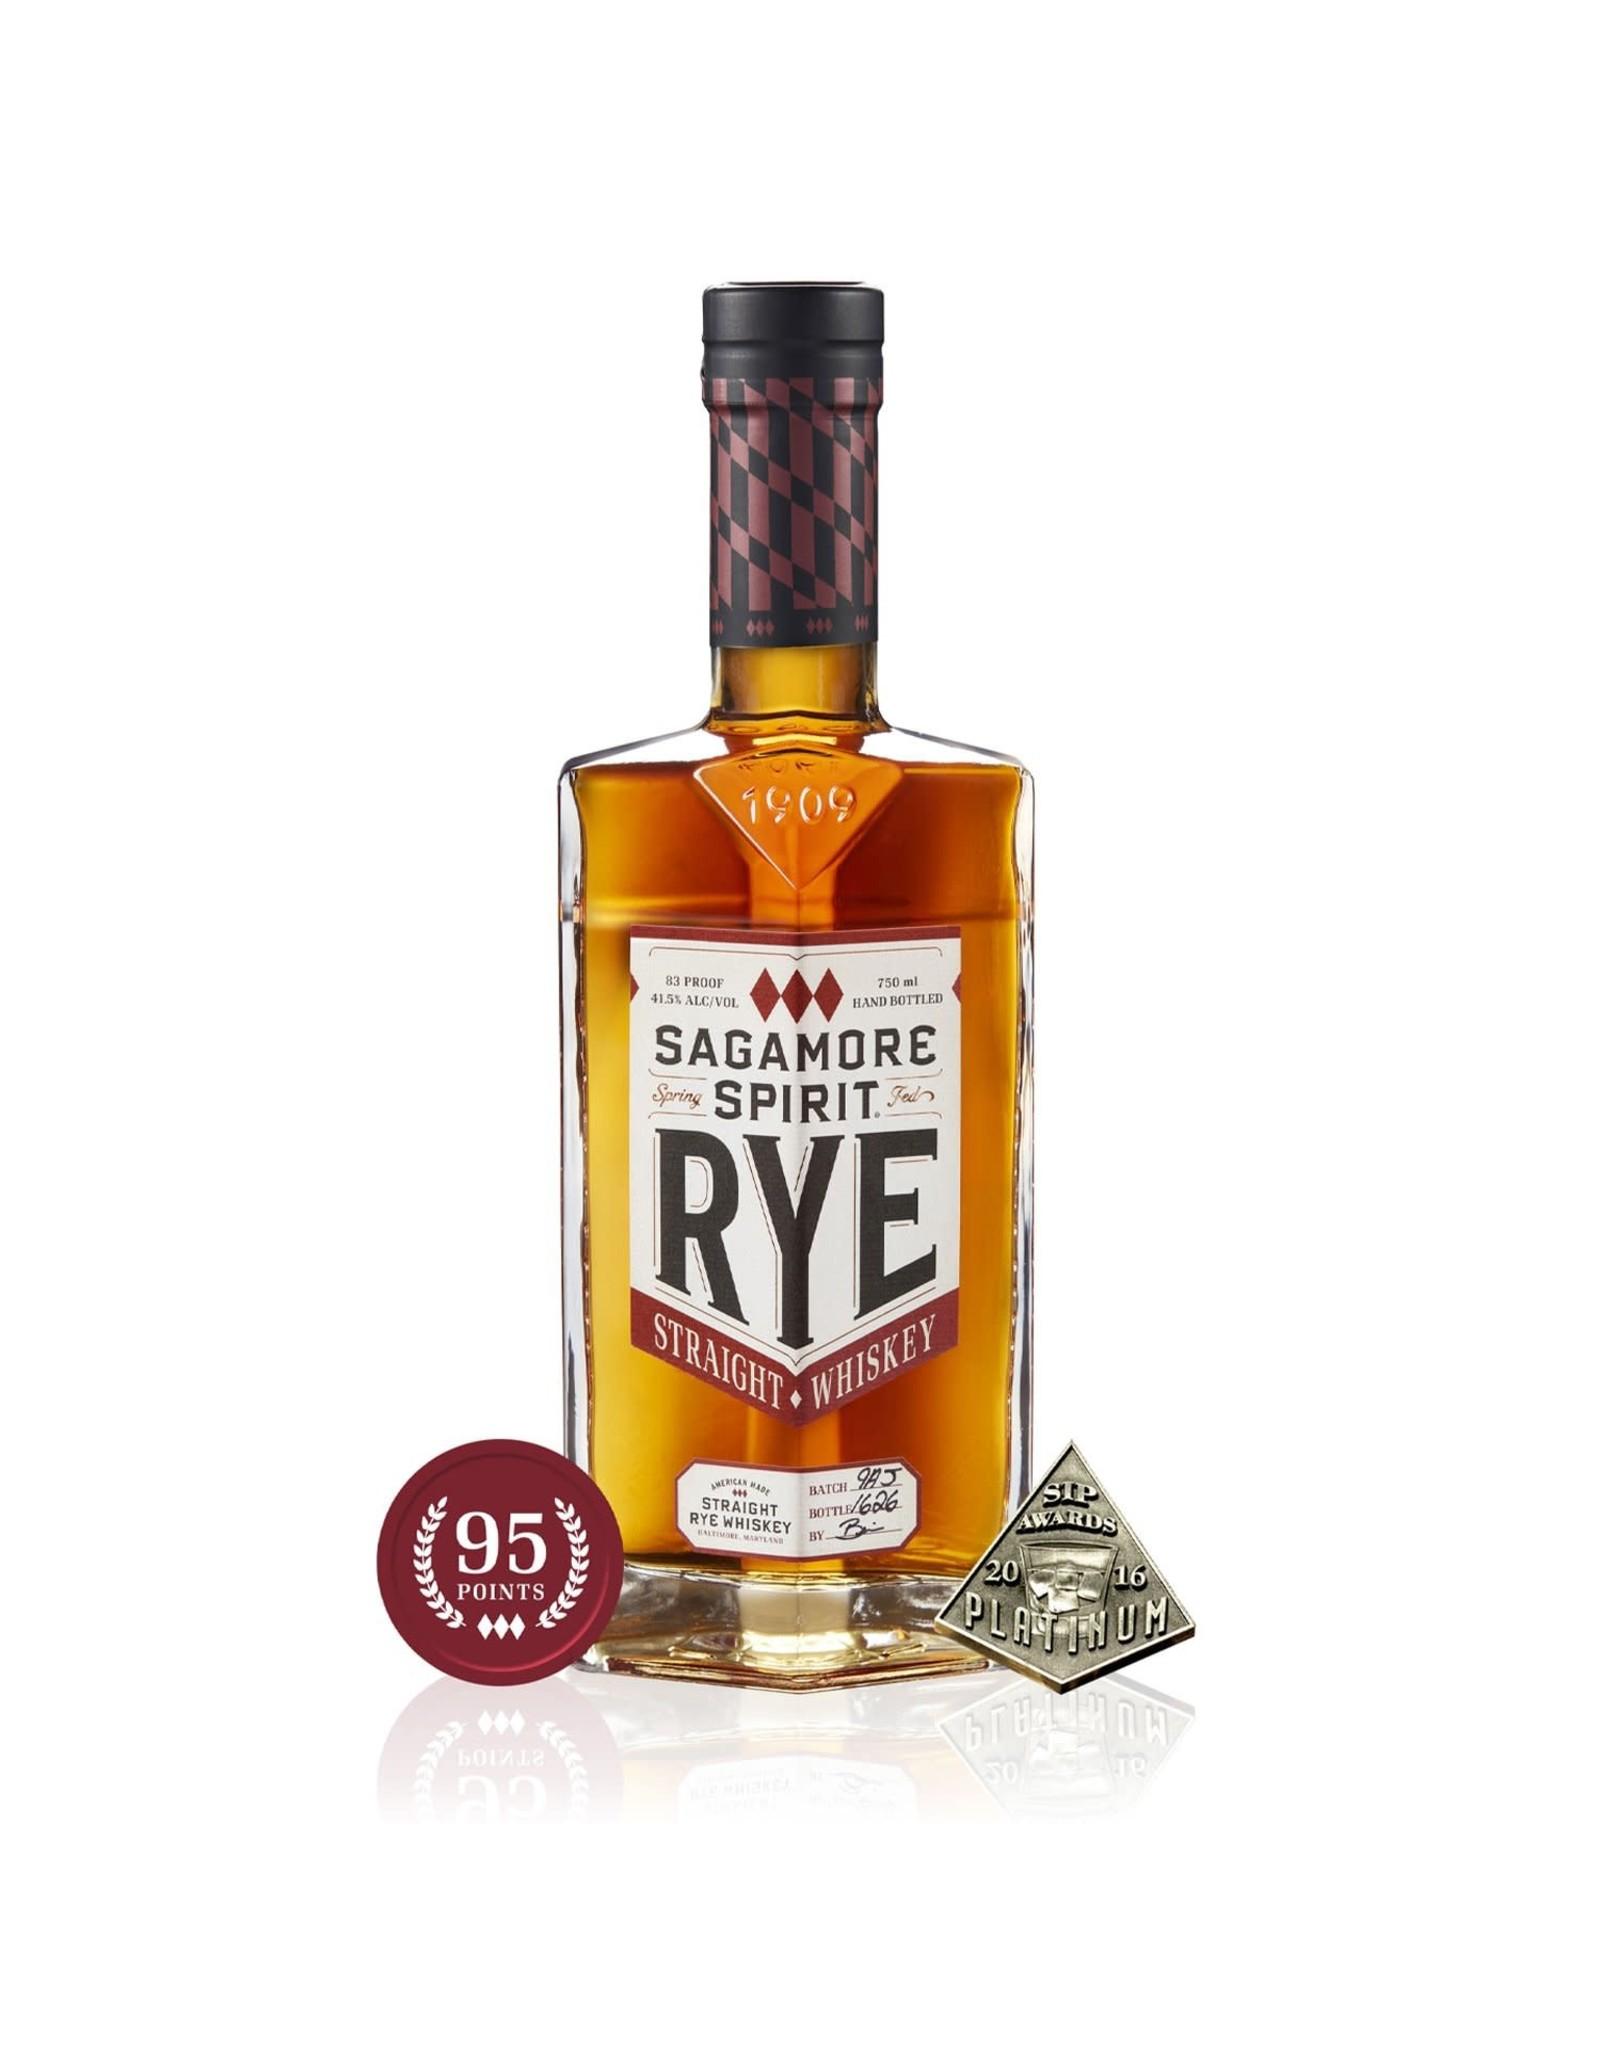 Sagamore Spirit Signature Rye